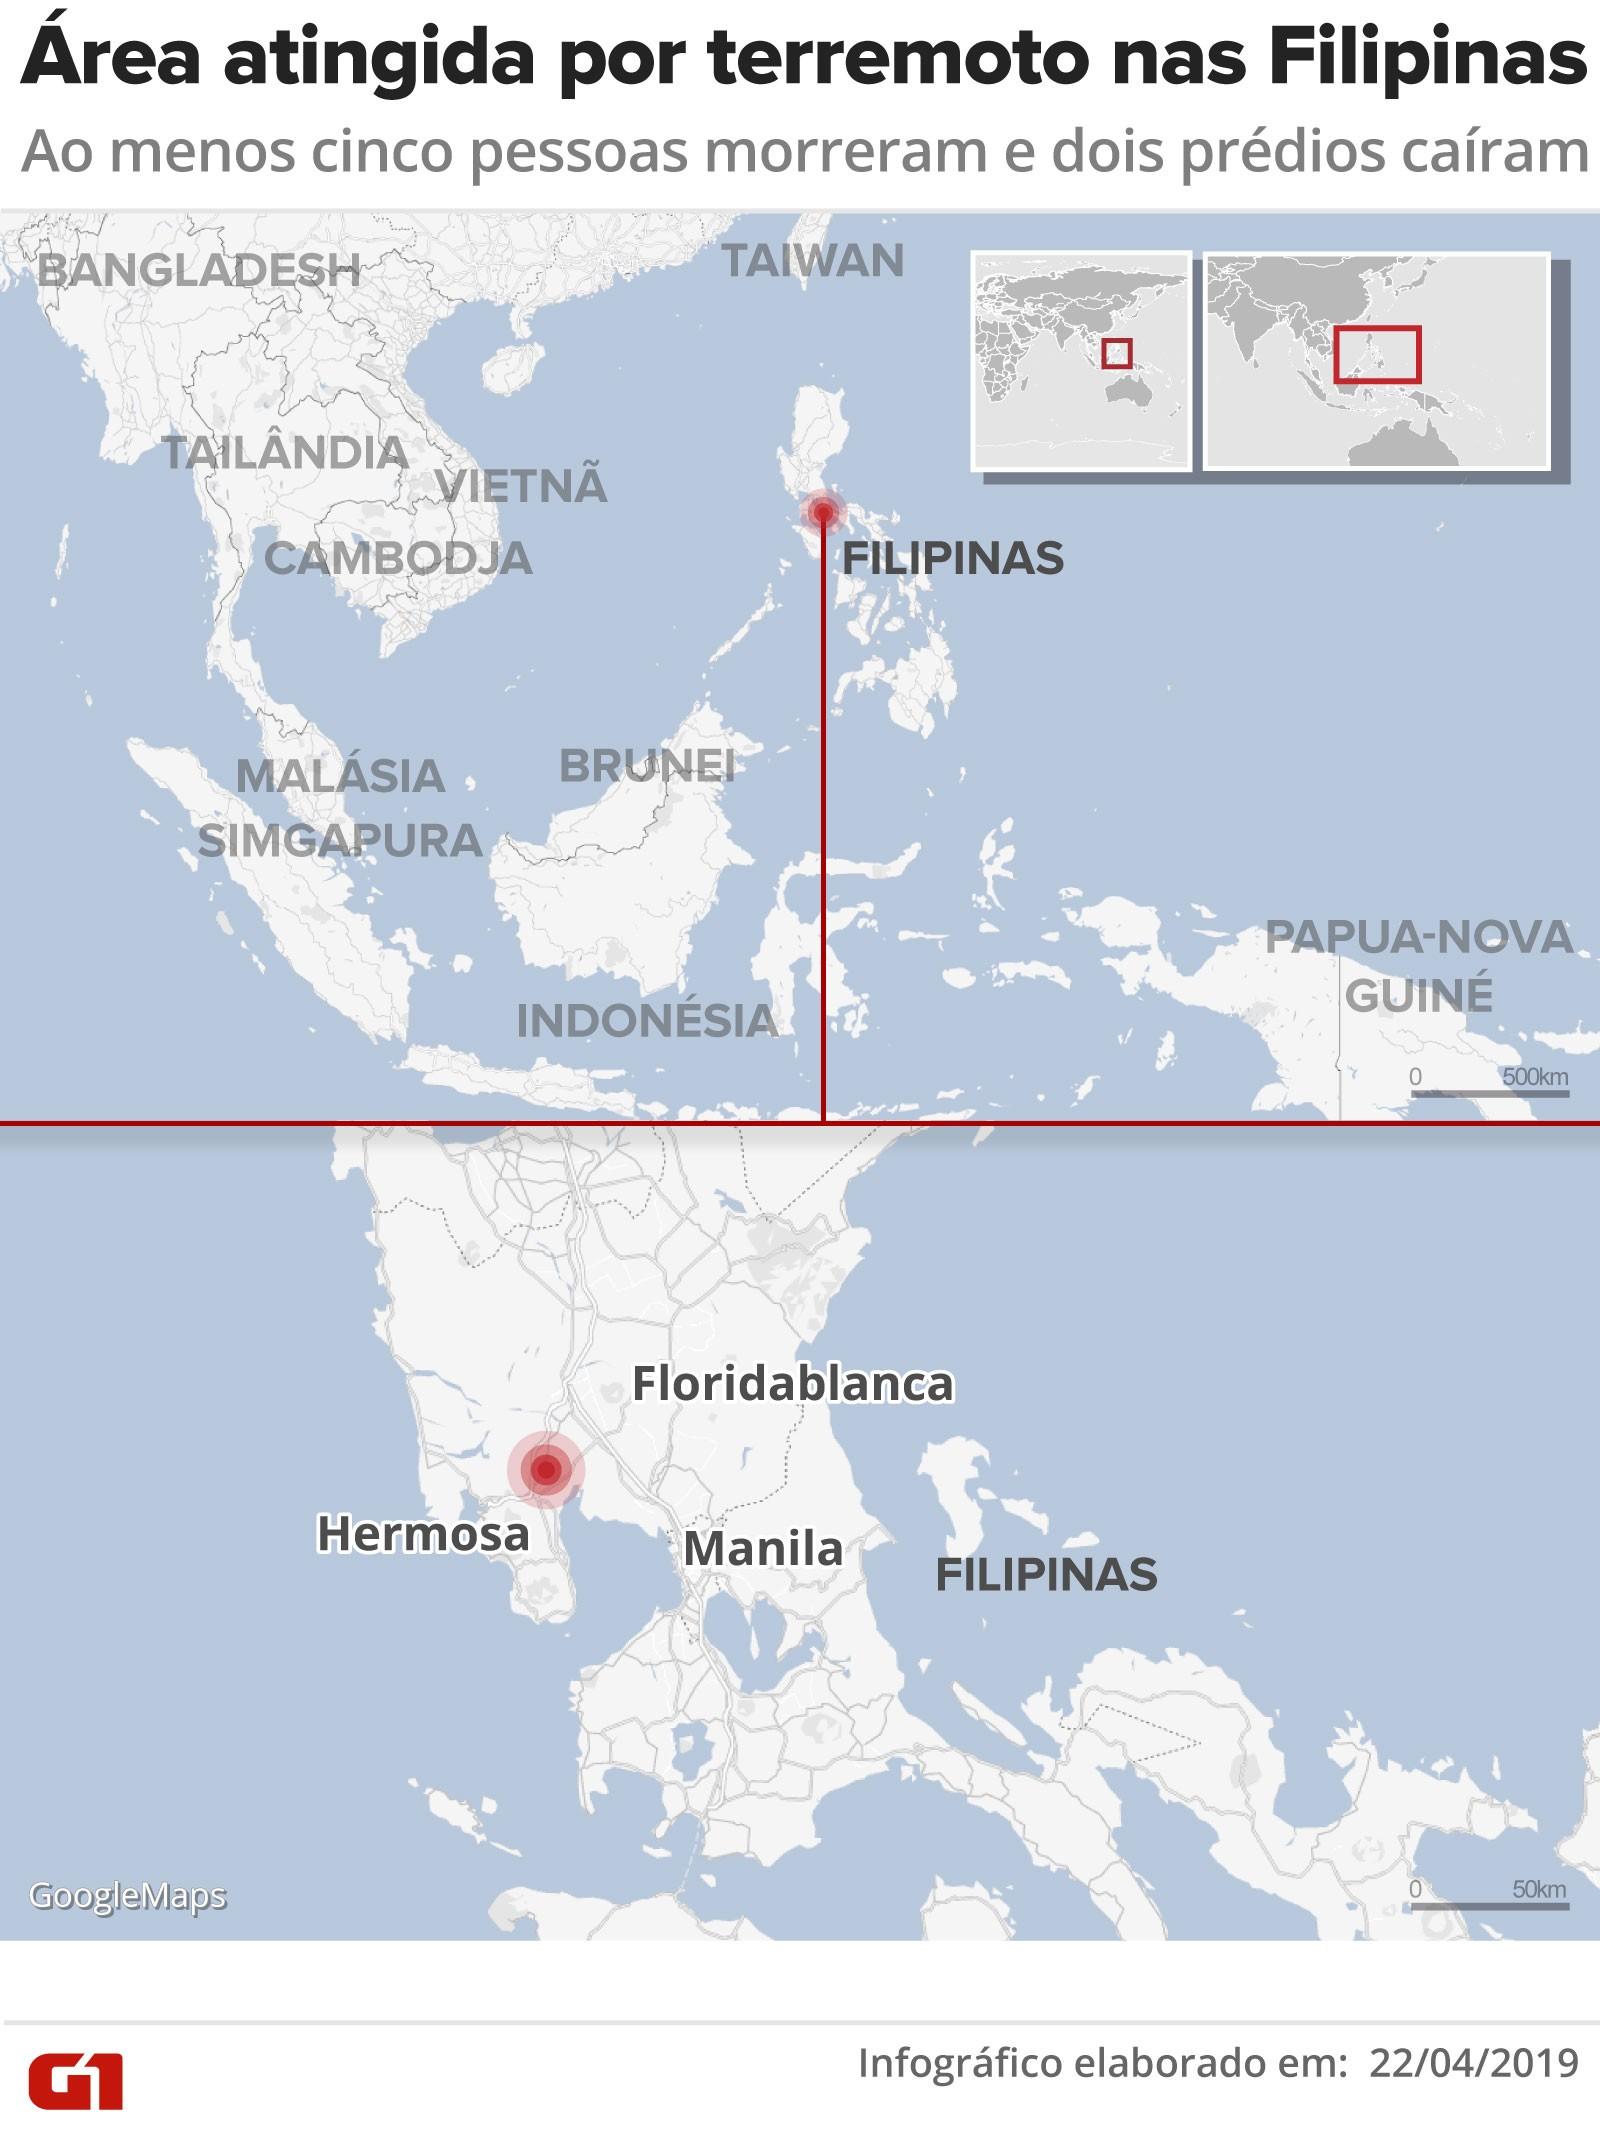 Novo terremoto atinge as Filipinas